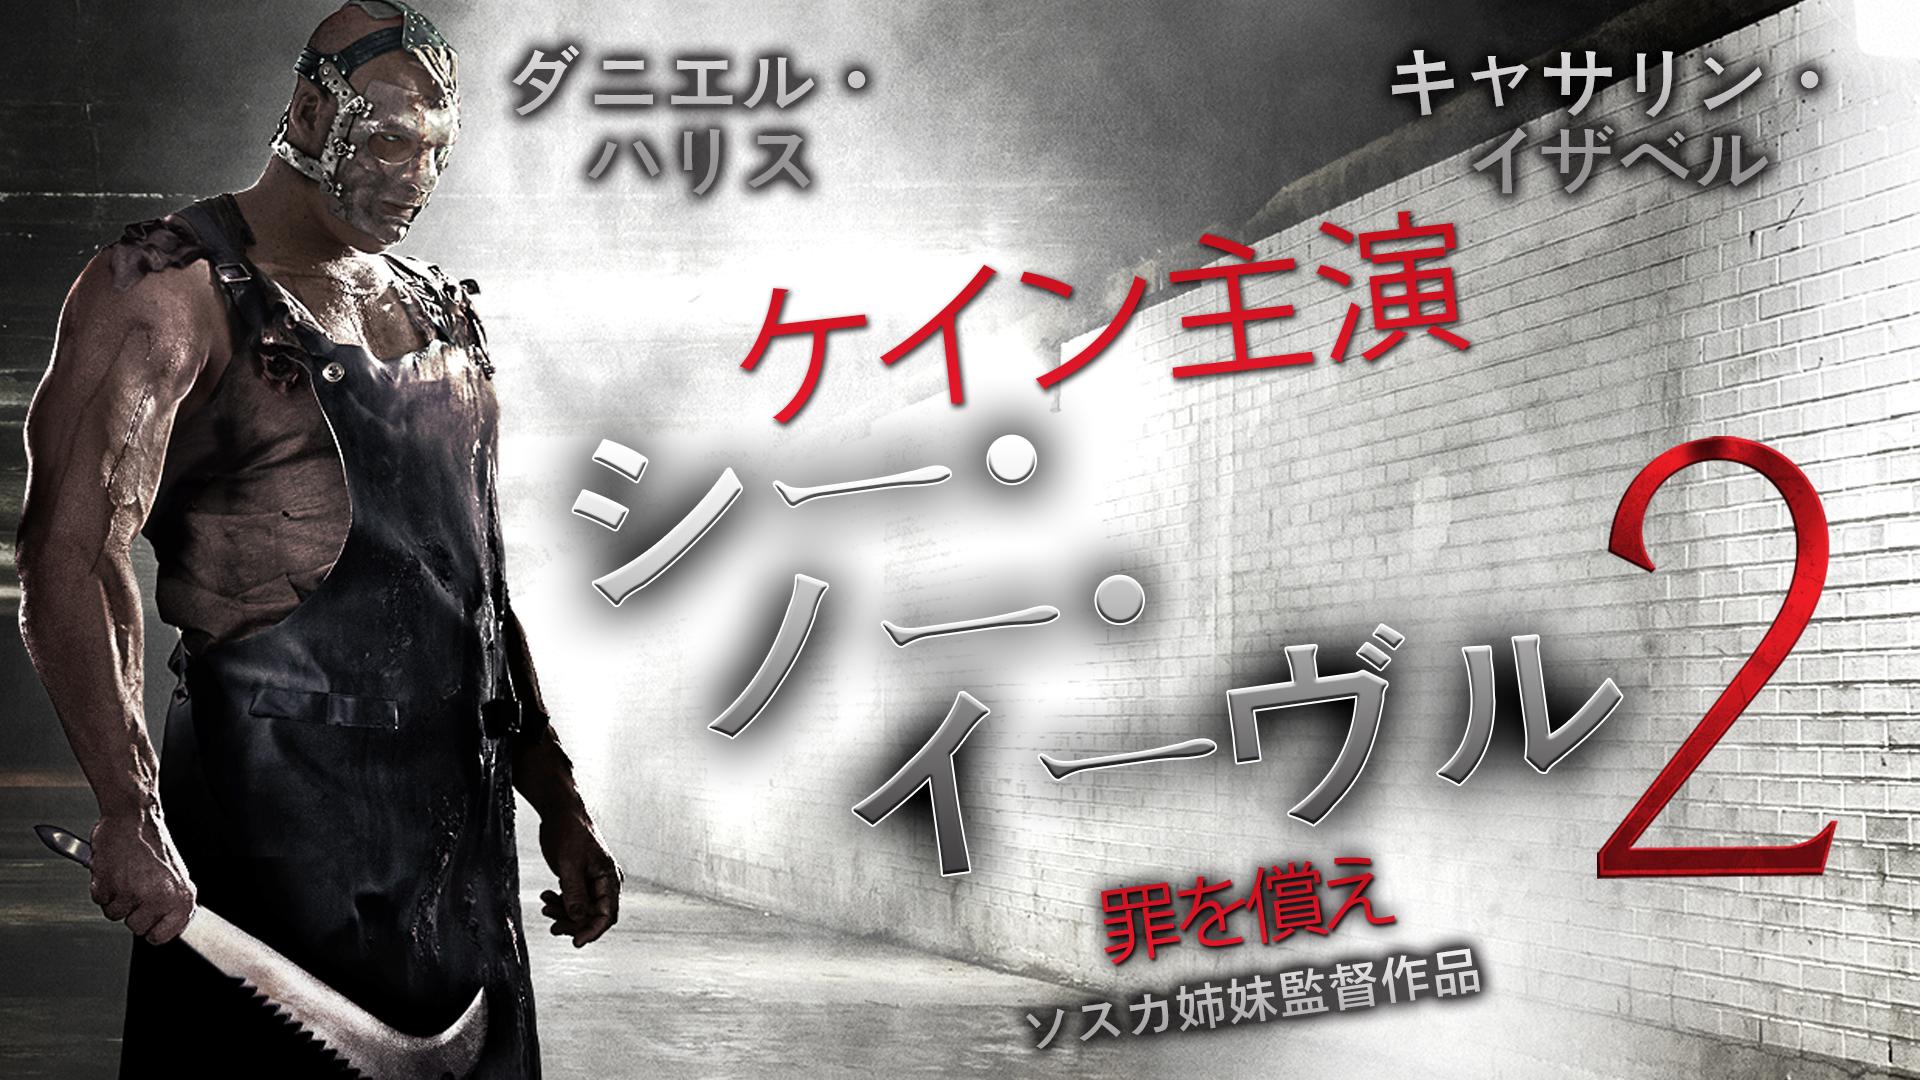 See No Evil 2 (字幕版)